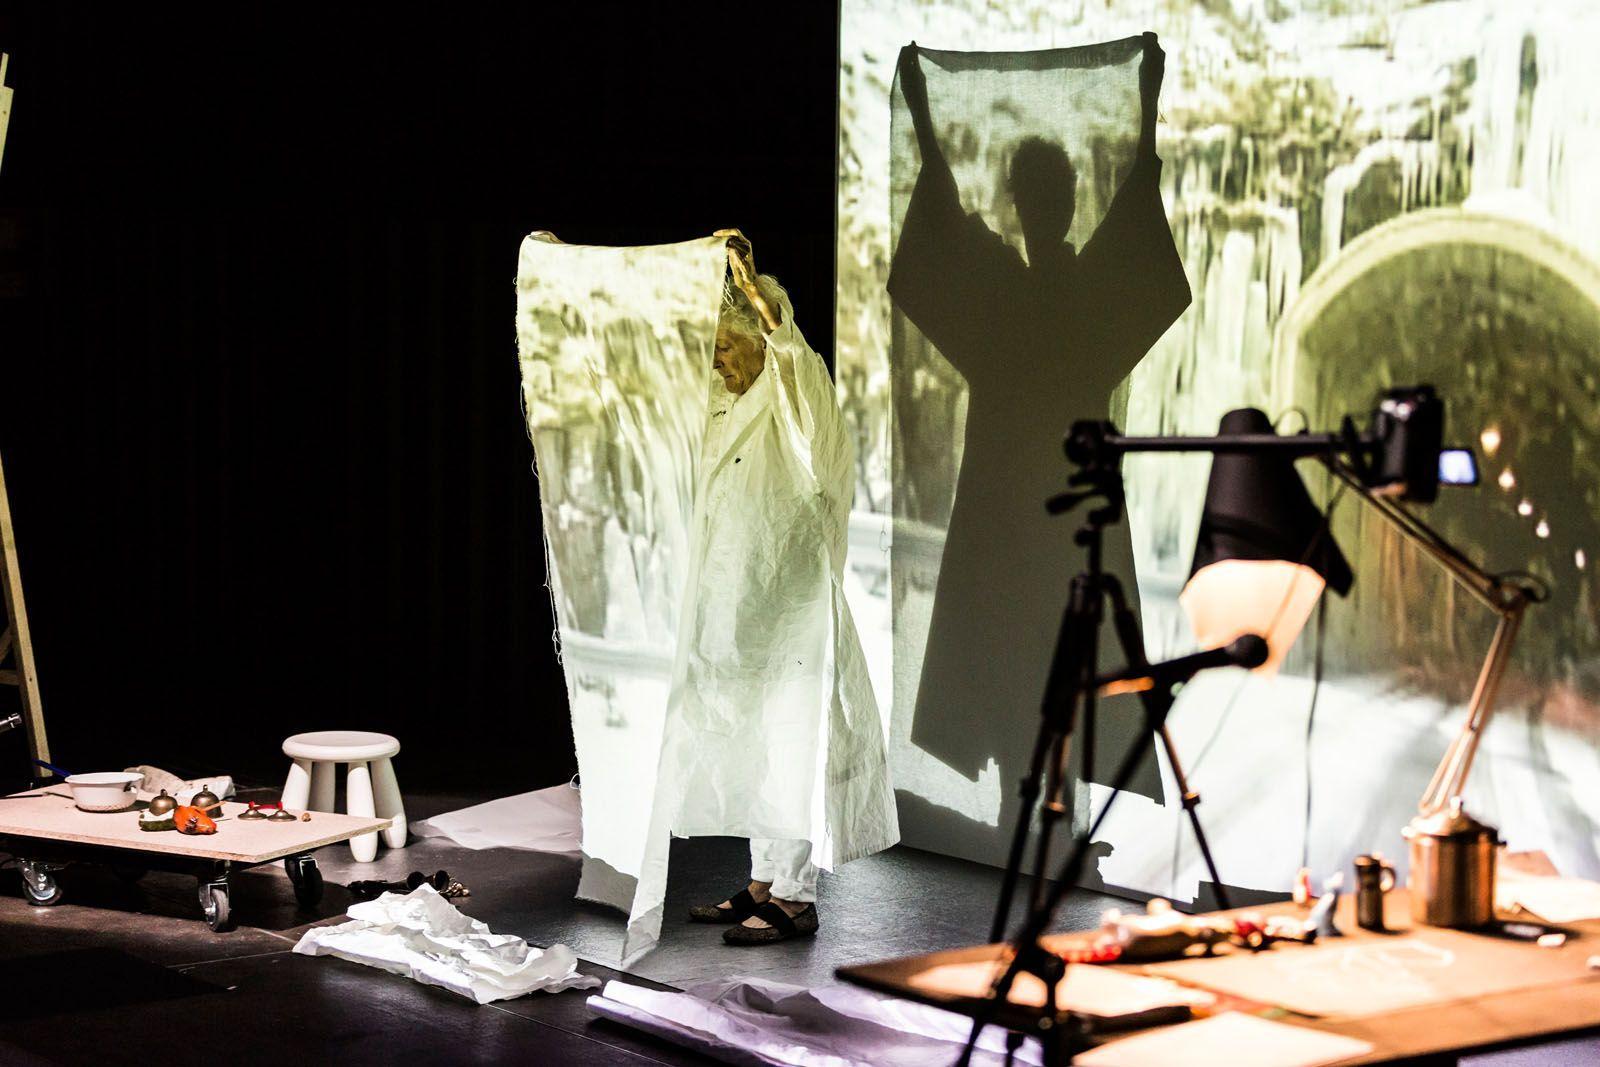 Joan Jonas, Reanimation (2010/2012/2013), performance en Fondazione HangarBicocca, Milán, 2014. Foto: Matteo Scarpellini/almaphotos.net. Cortesía de la artista